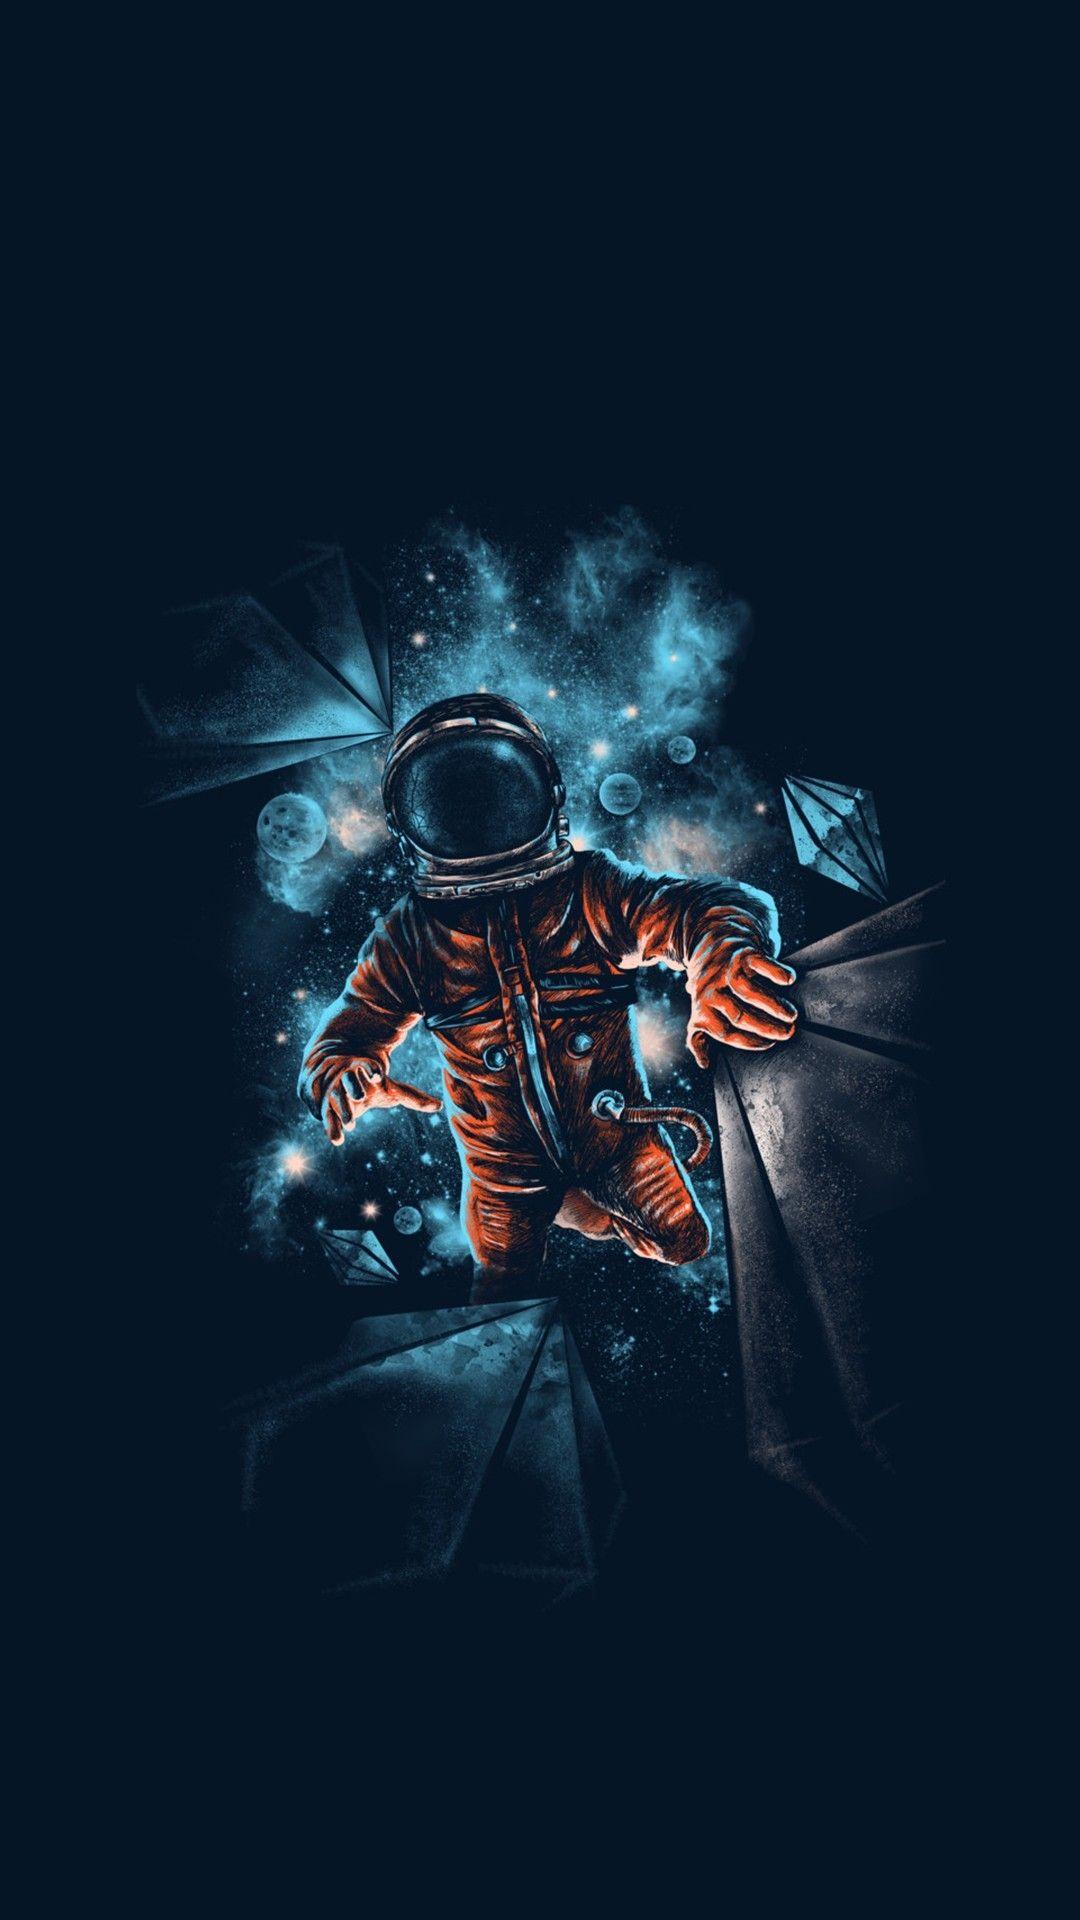 Love Spells Psychic Medium Consultant And Voodoo Spells Call Whatssap 27786966898 Info Spiritualhealerpsychi Astronaut Wallpaper Wallpaper Space Astronaut Art